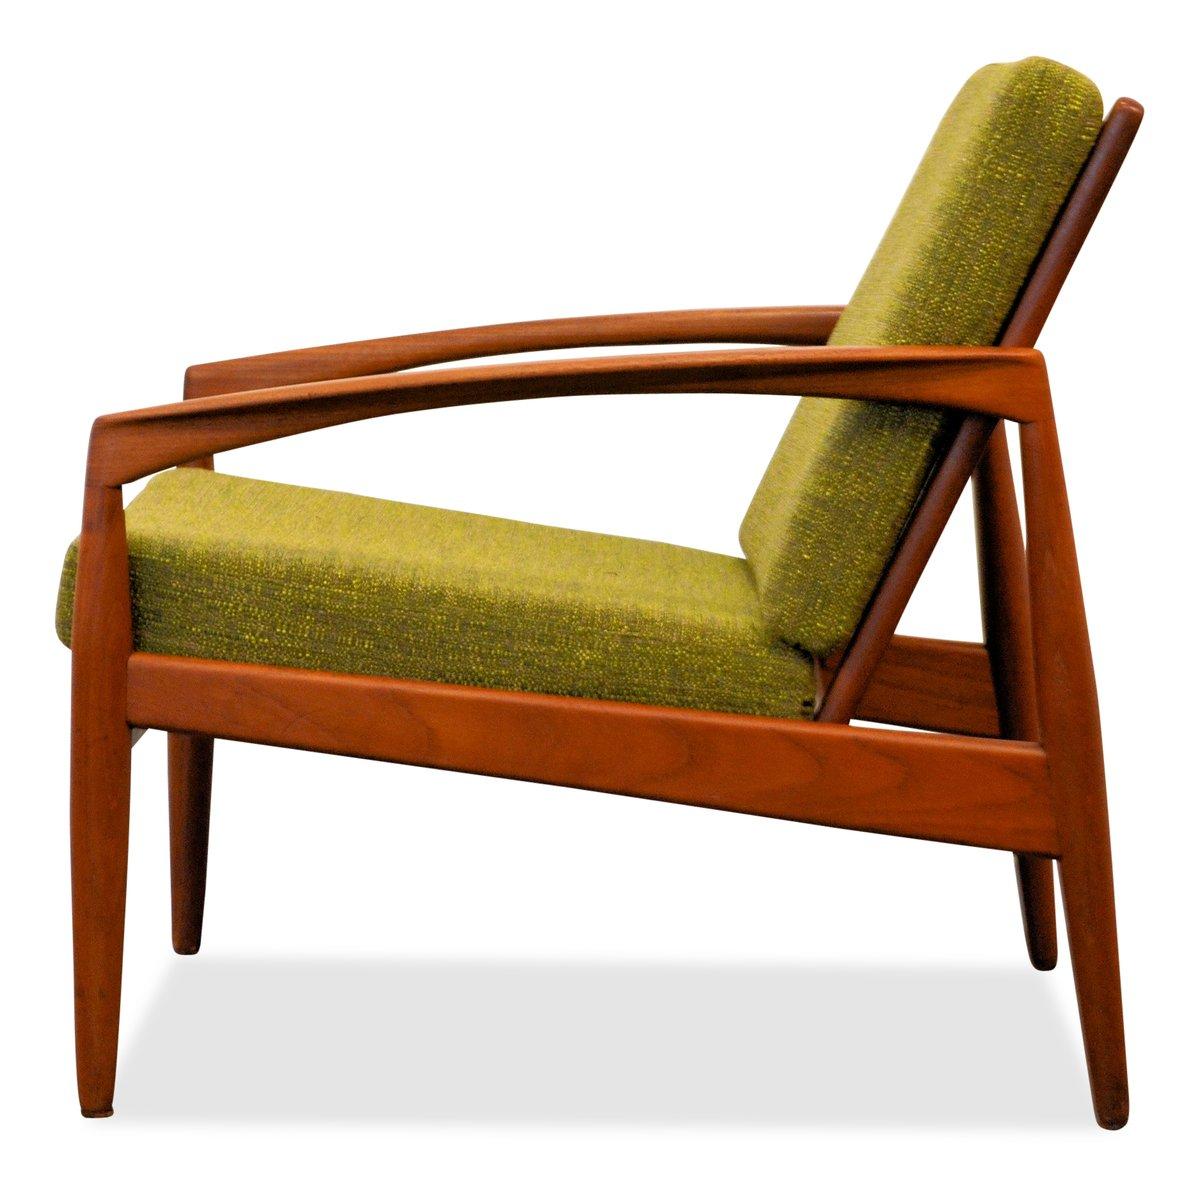 Model 121 Teak Lounge Chair by Kai Kristiansen for Magnus